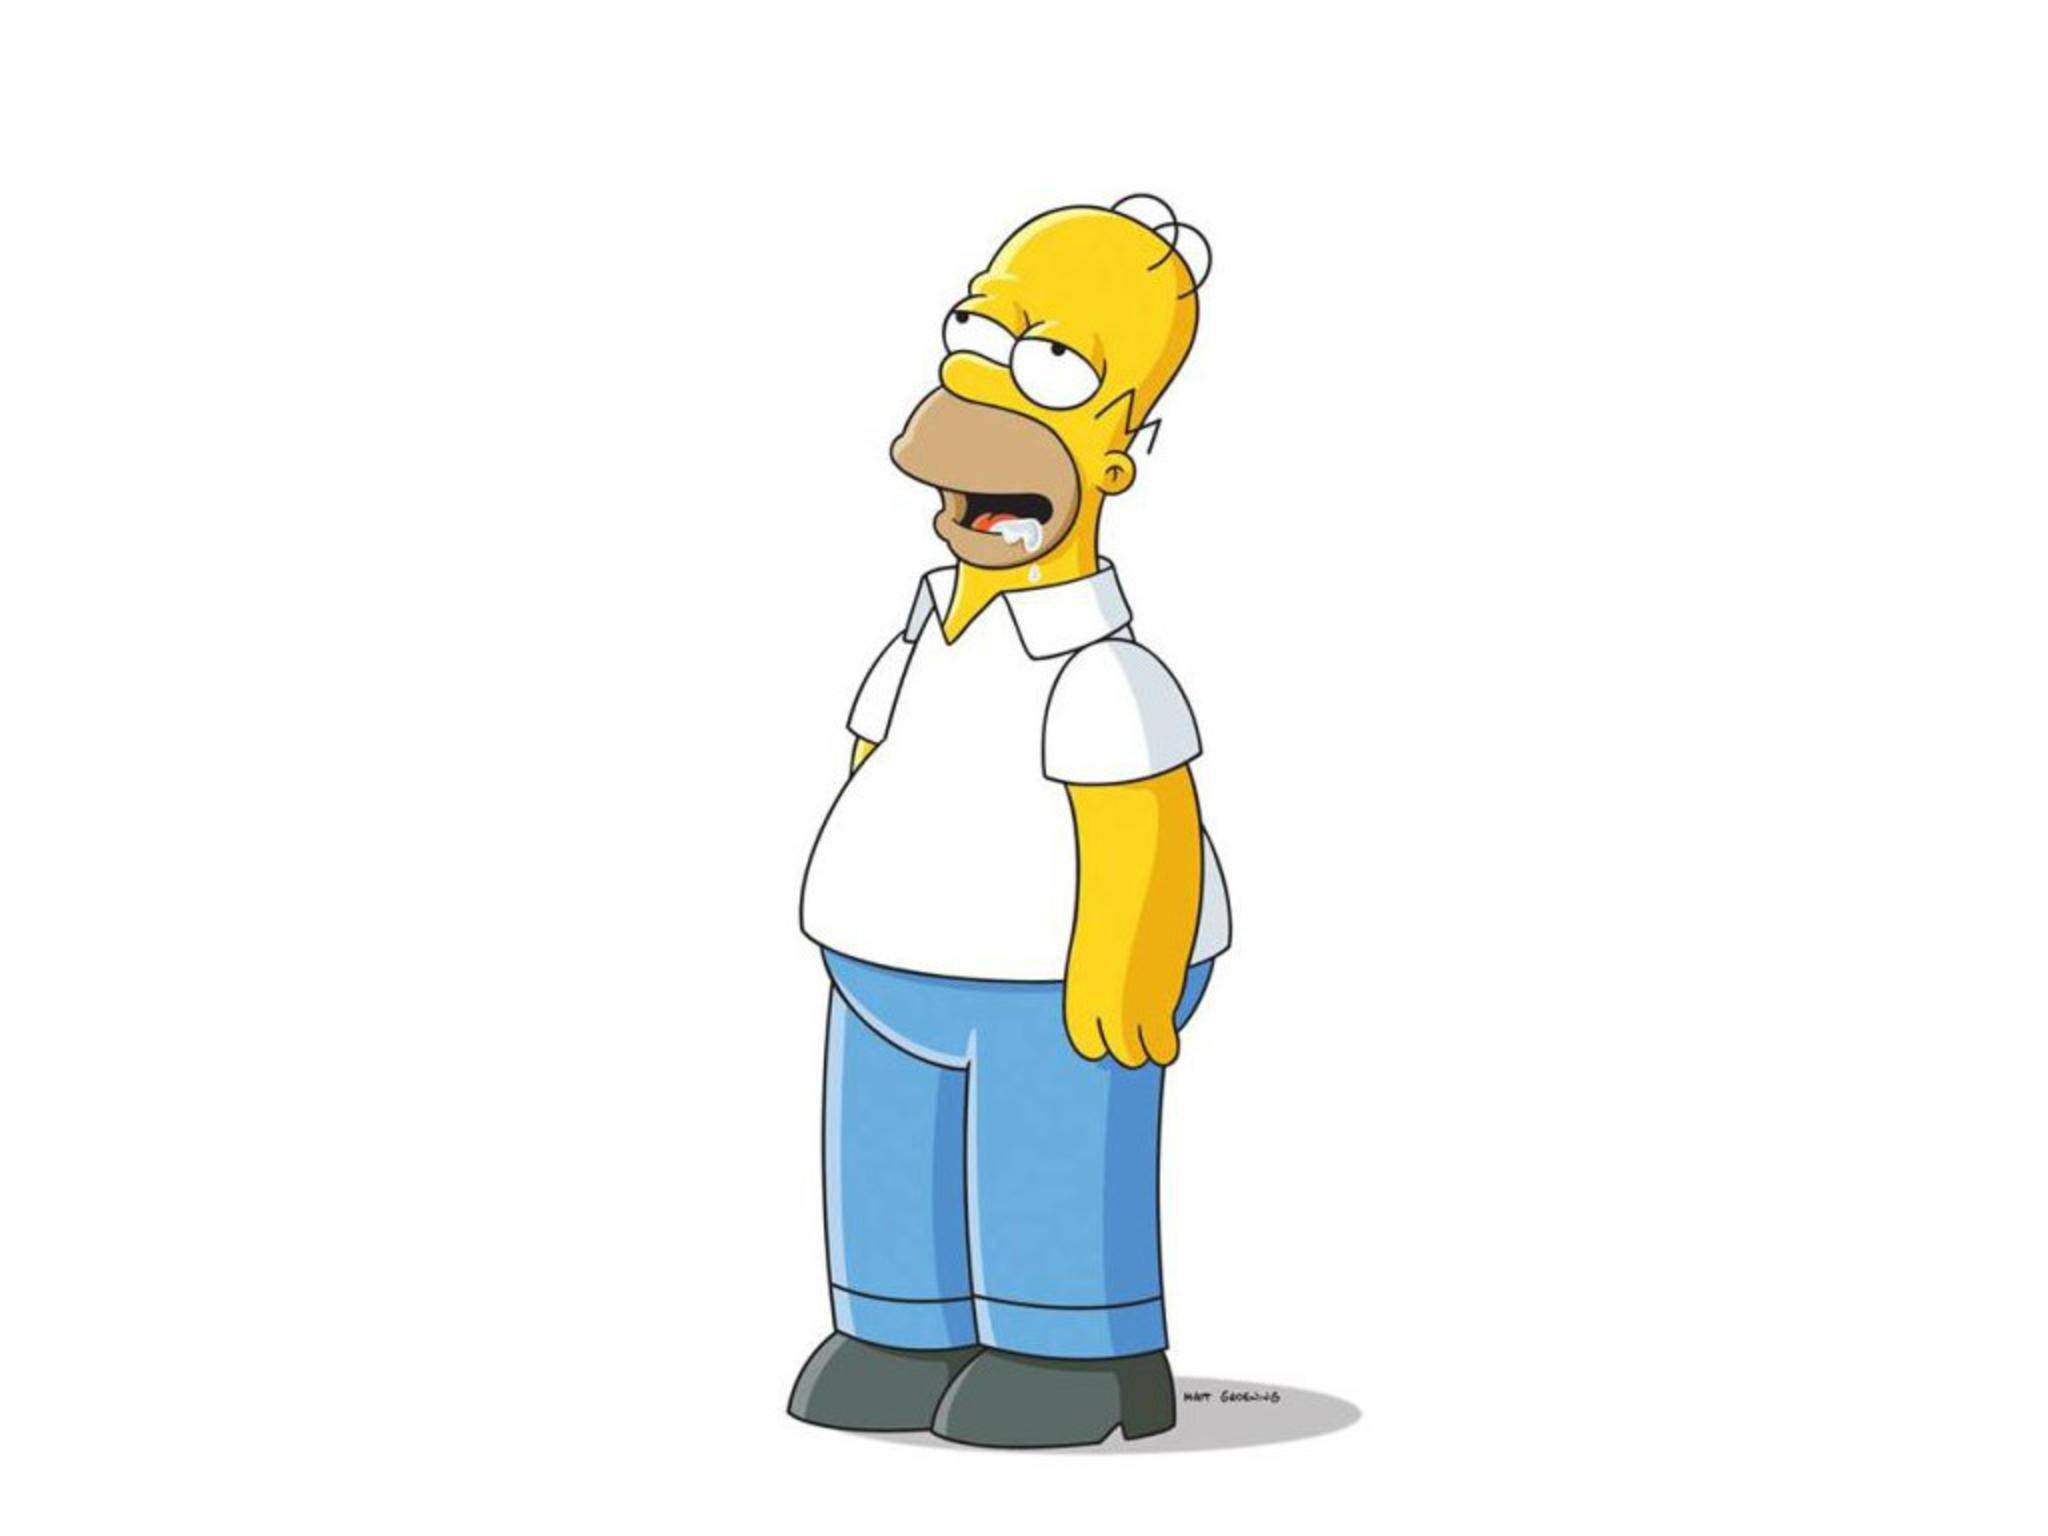 WhatsApp Bilder Facebook_The Simpsons 2